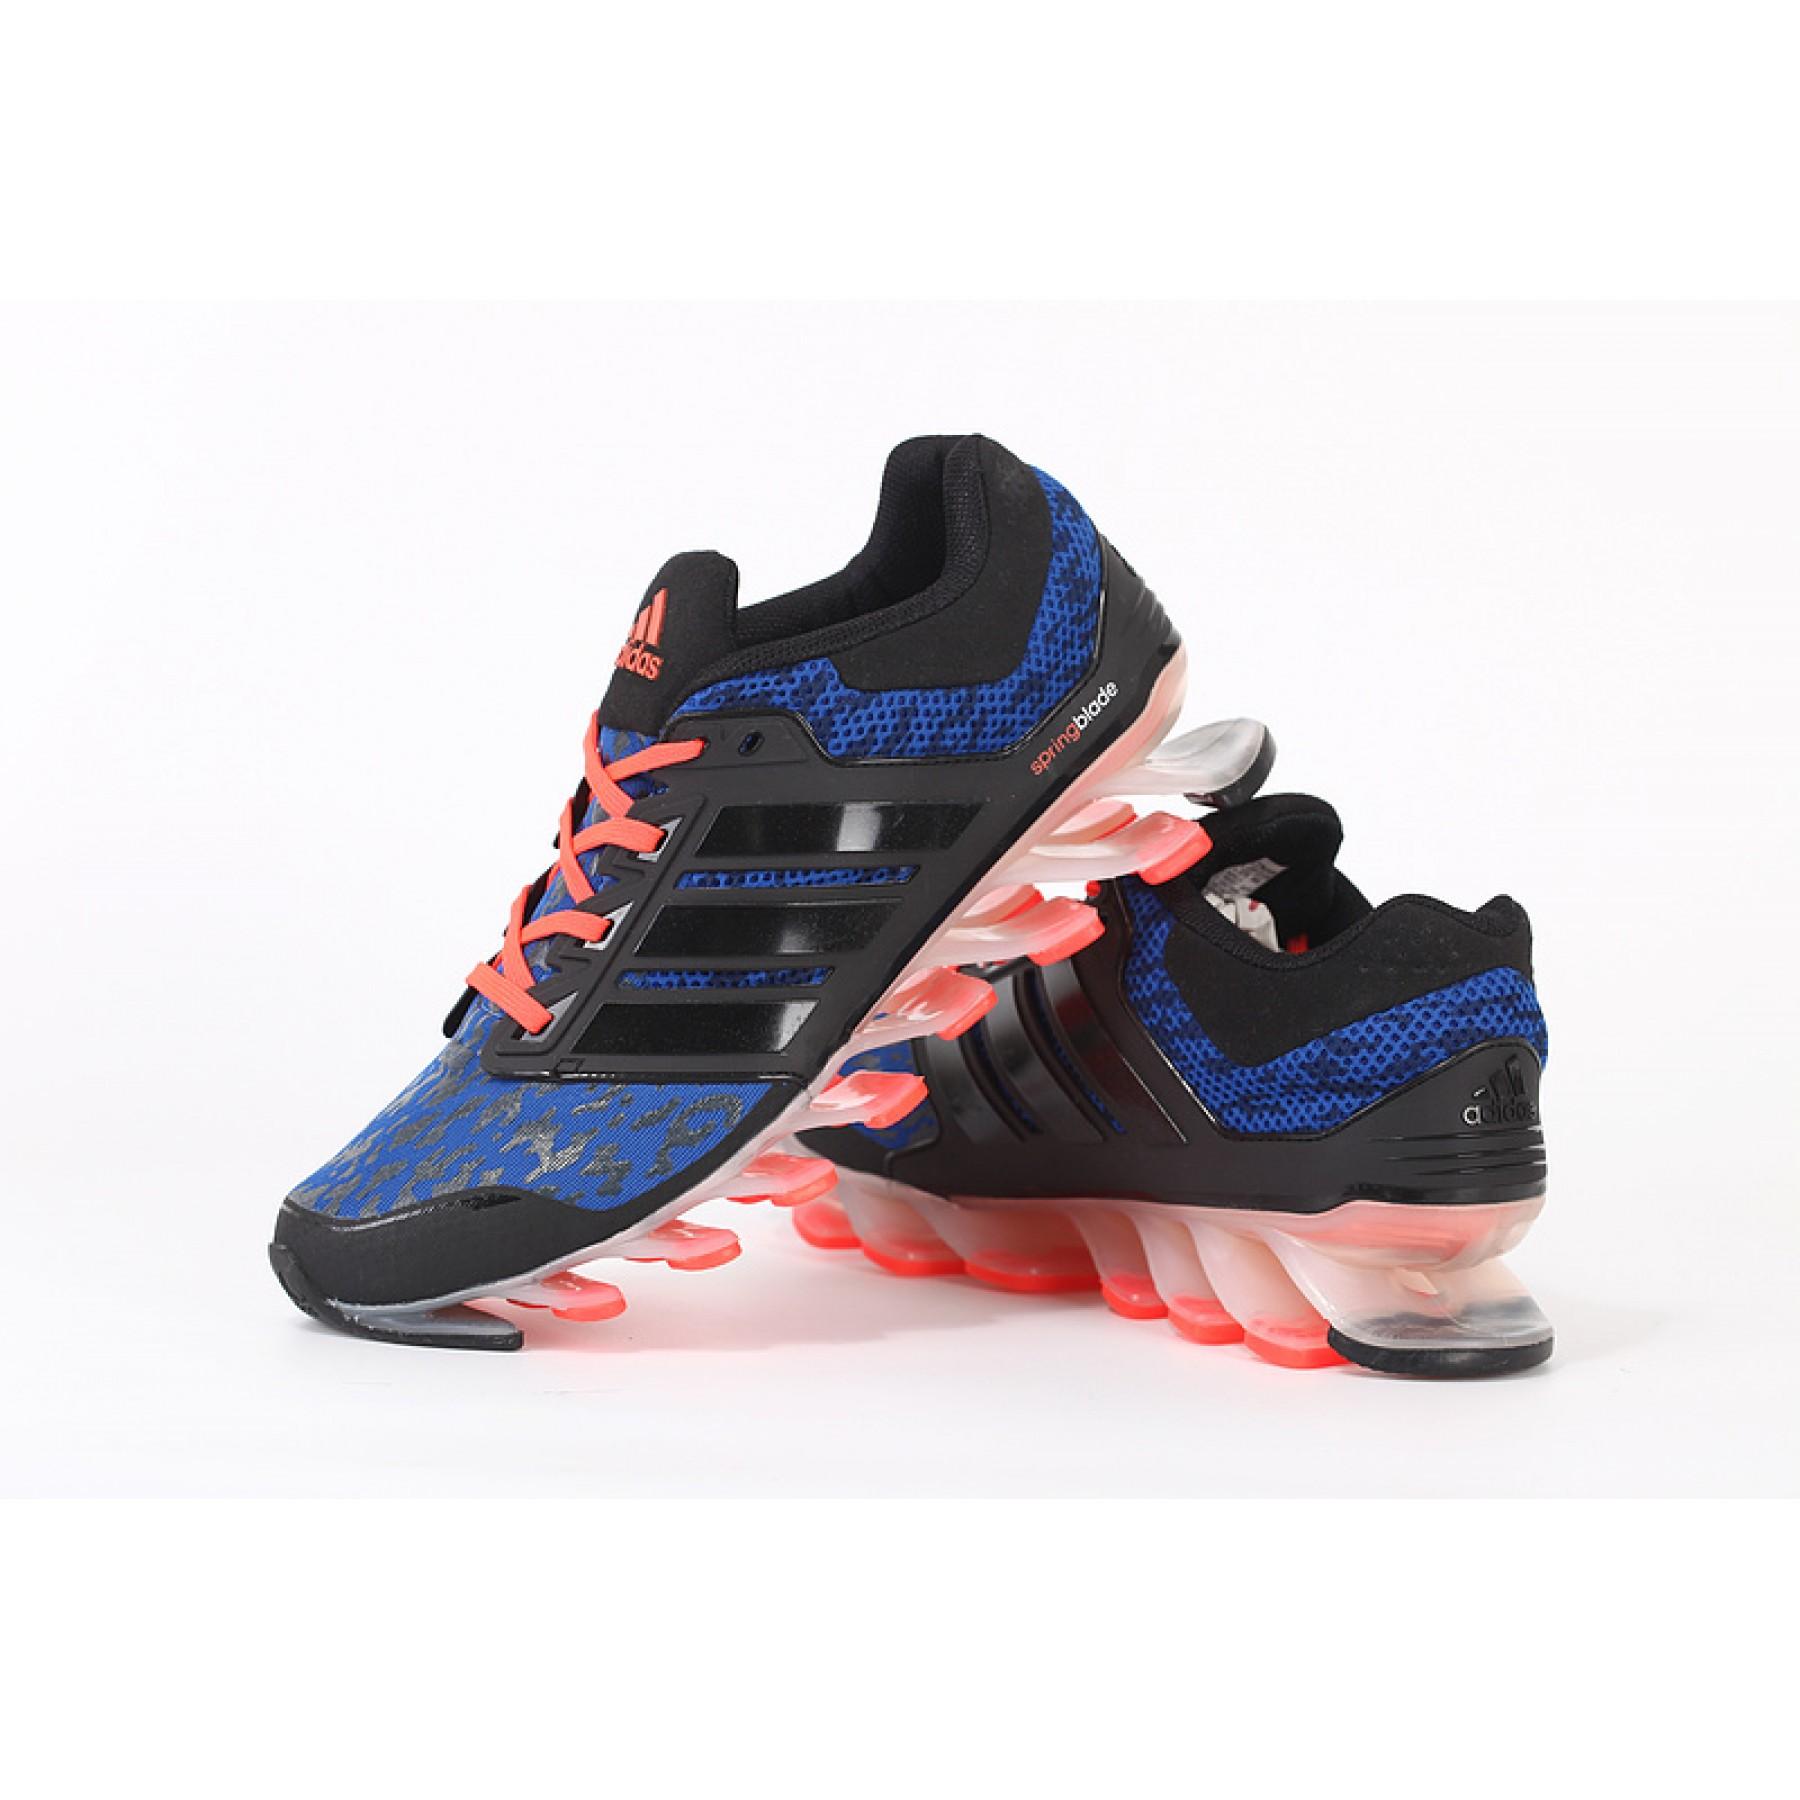 ab15b12efbe Tênis Adidas SpringBlade Drive Masculino Cor Azul Preto e Laranja Cod 0462